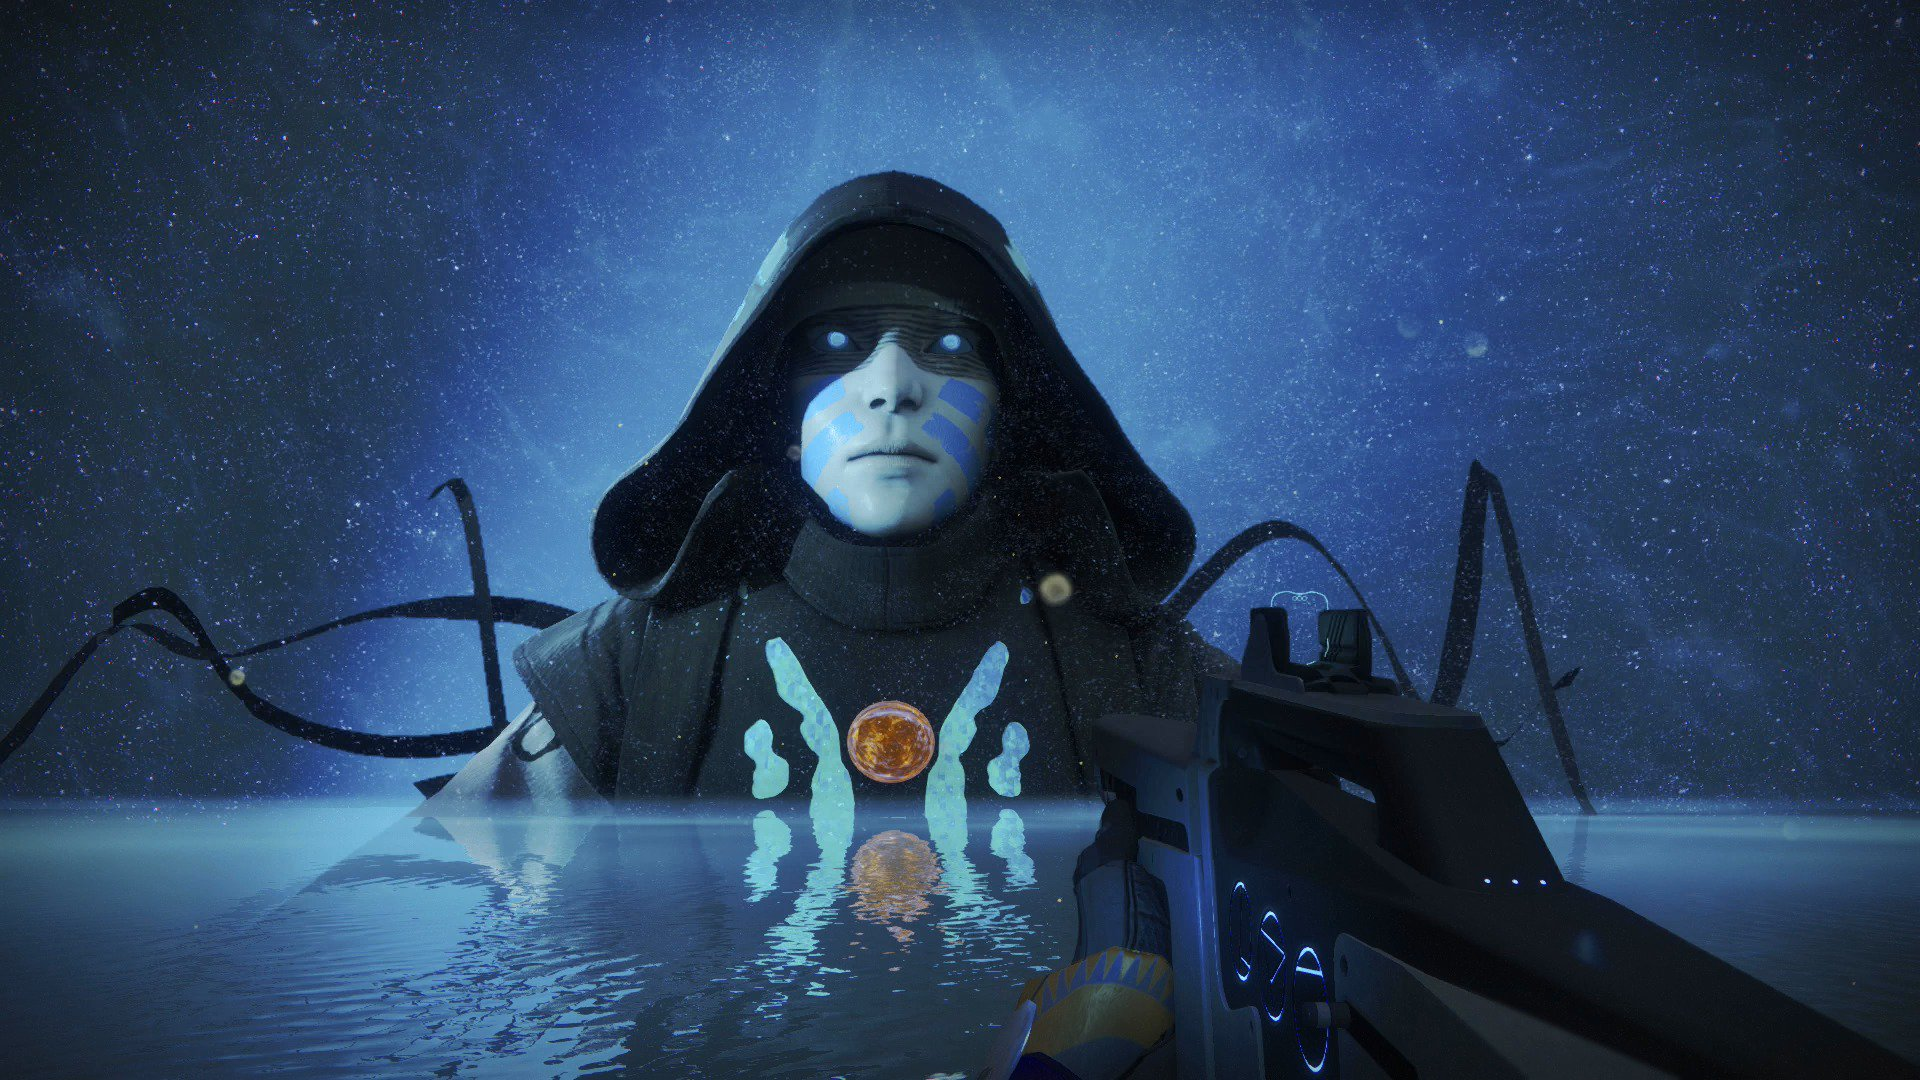 Destiny 2: Prüfungen der Neun – Alle Infos zu den Trials of the Nine